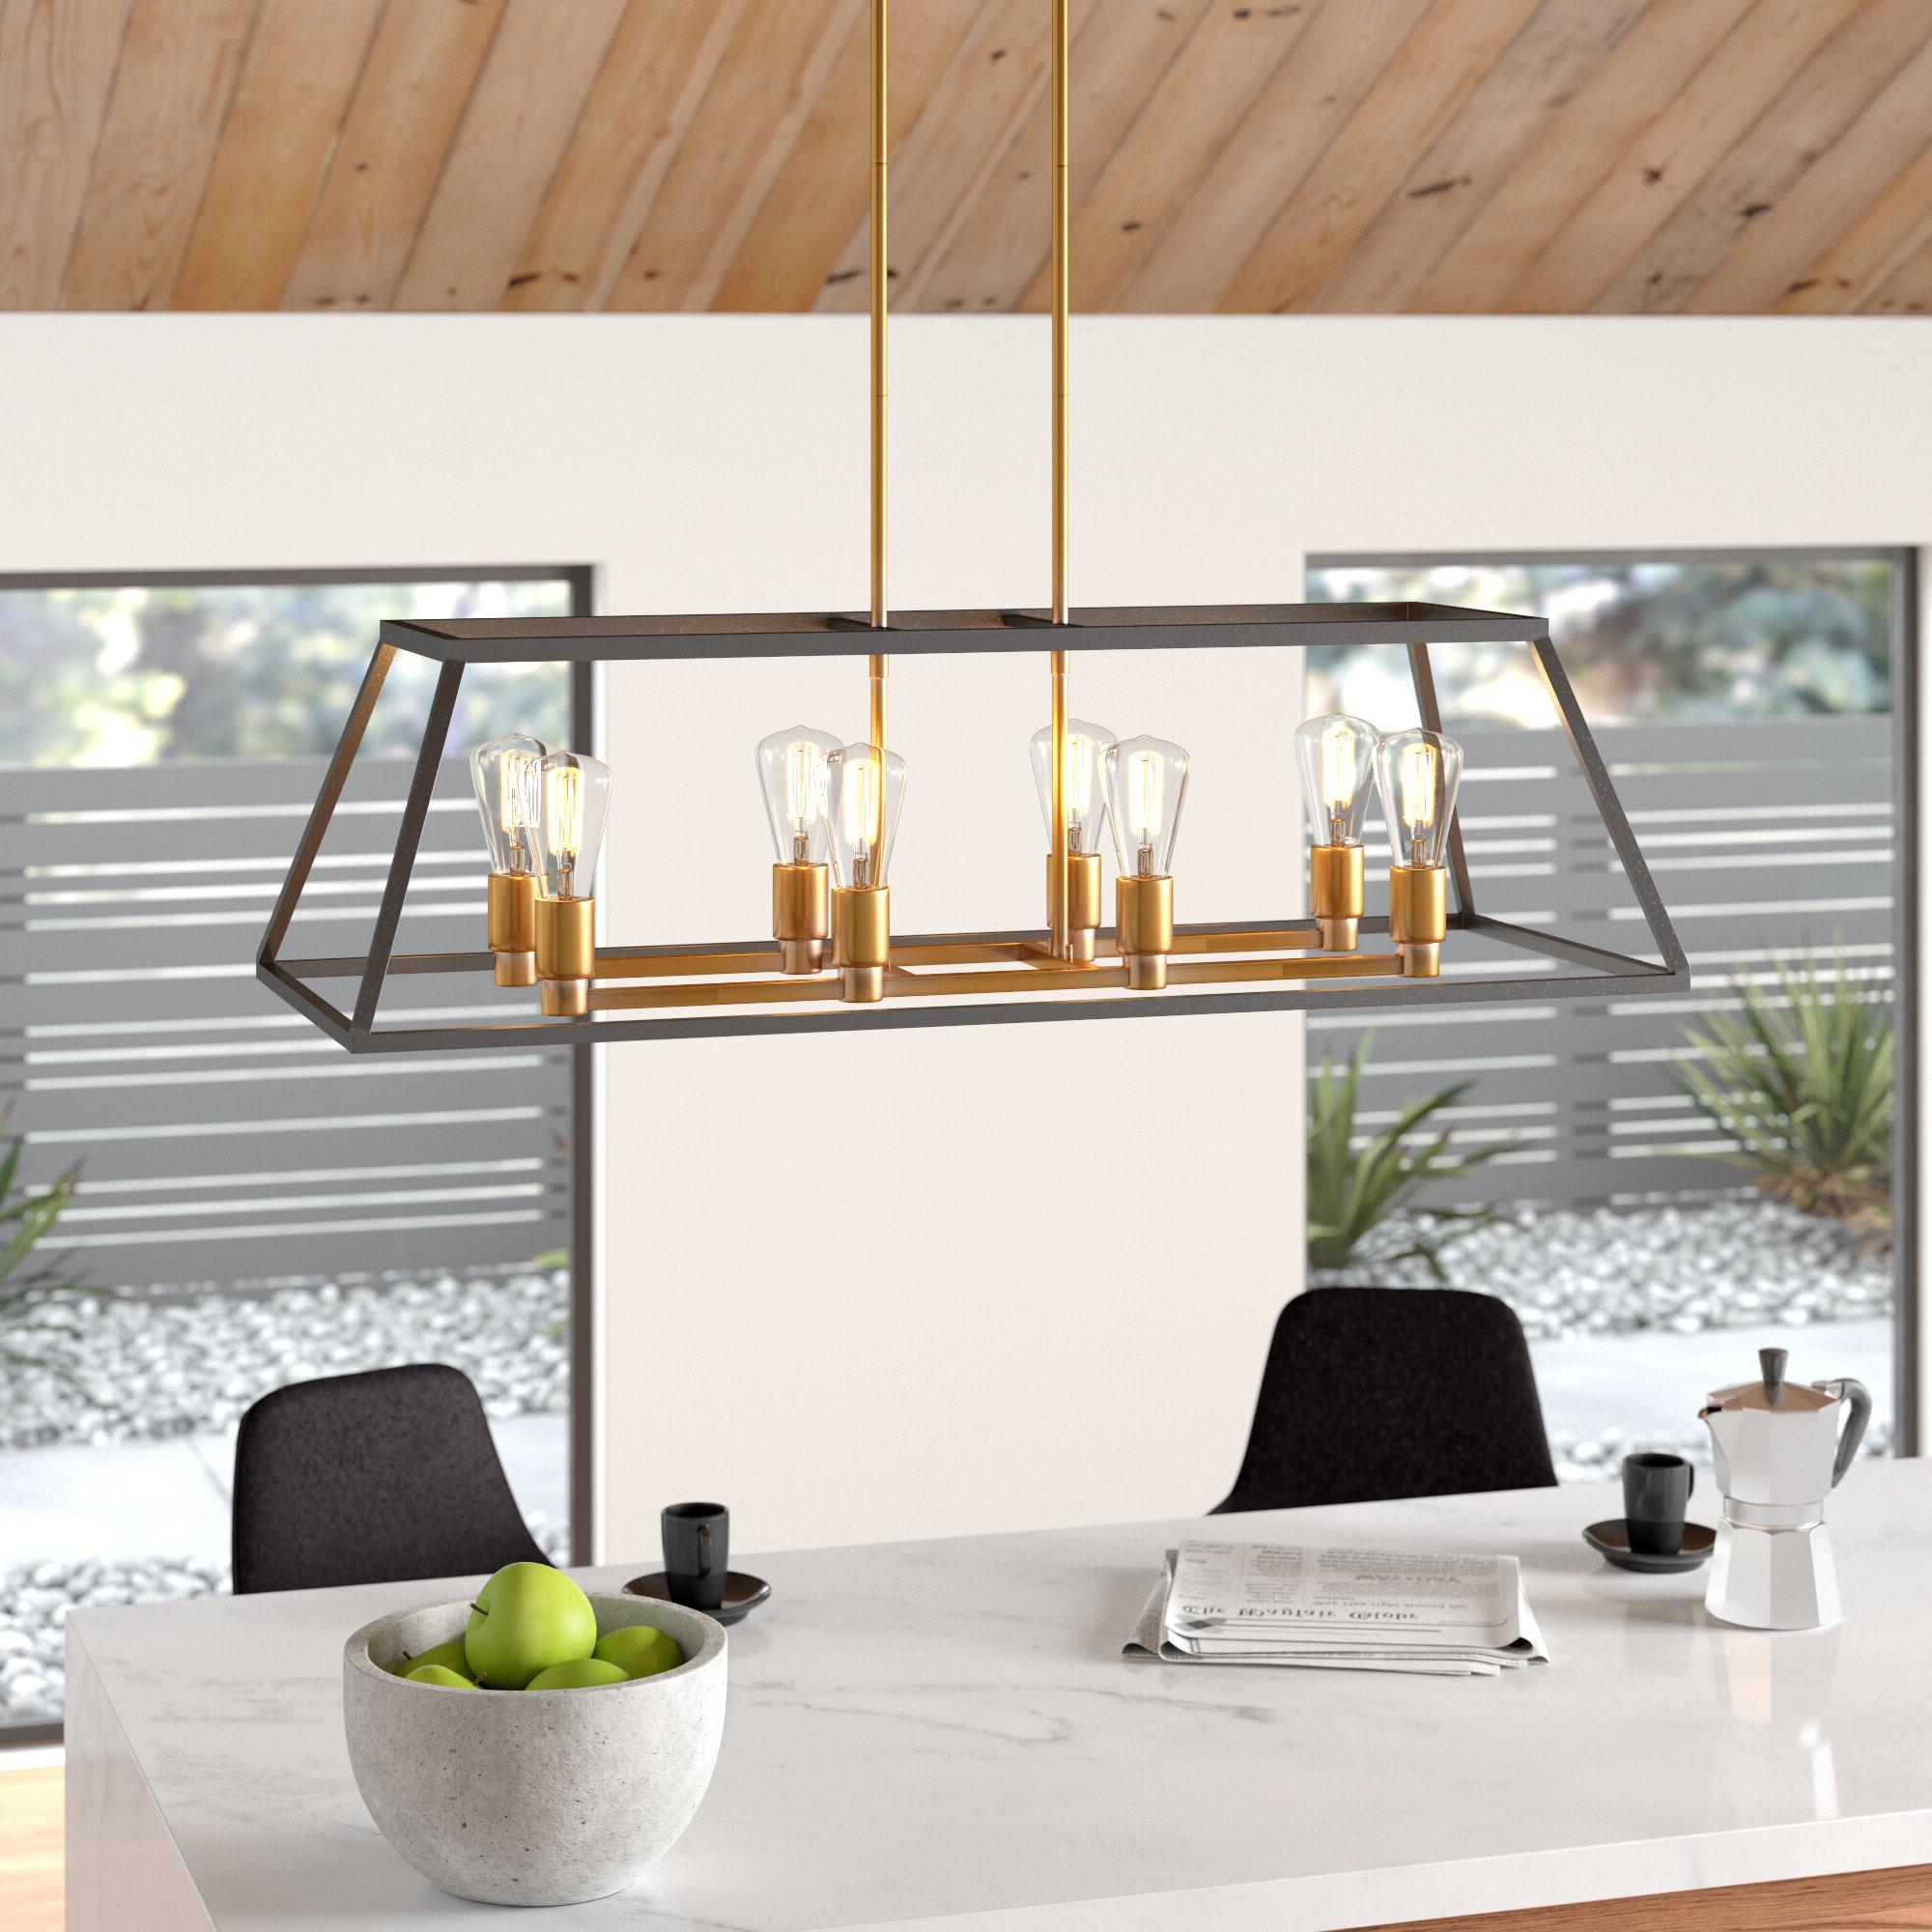 Jefferson 4 Light Kitchen Island Linear Pendants Intended For Preferred Shisler 8 Light Kitchen Island Linear Pendant (View 10 of 25)